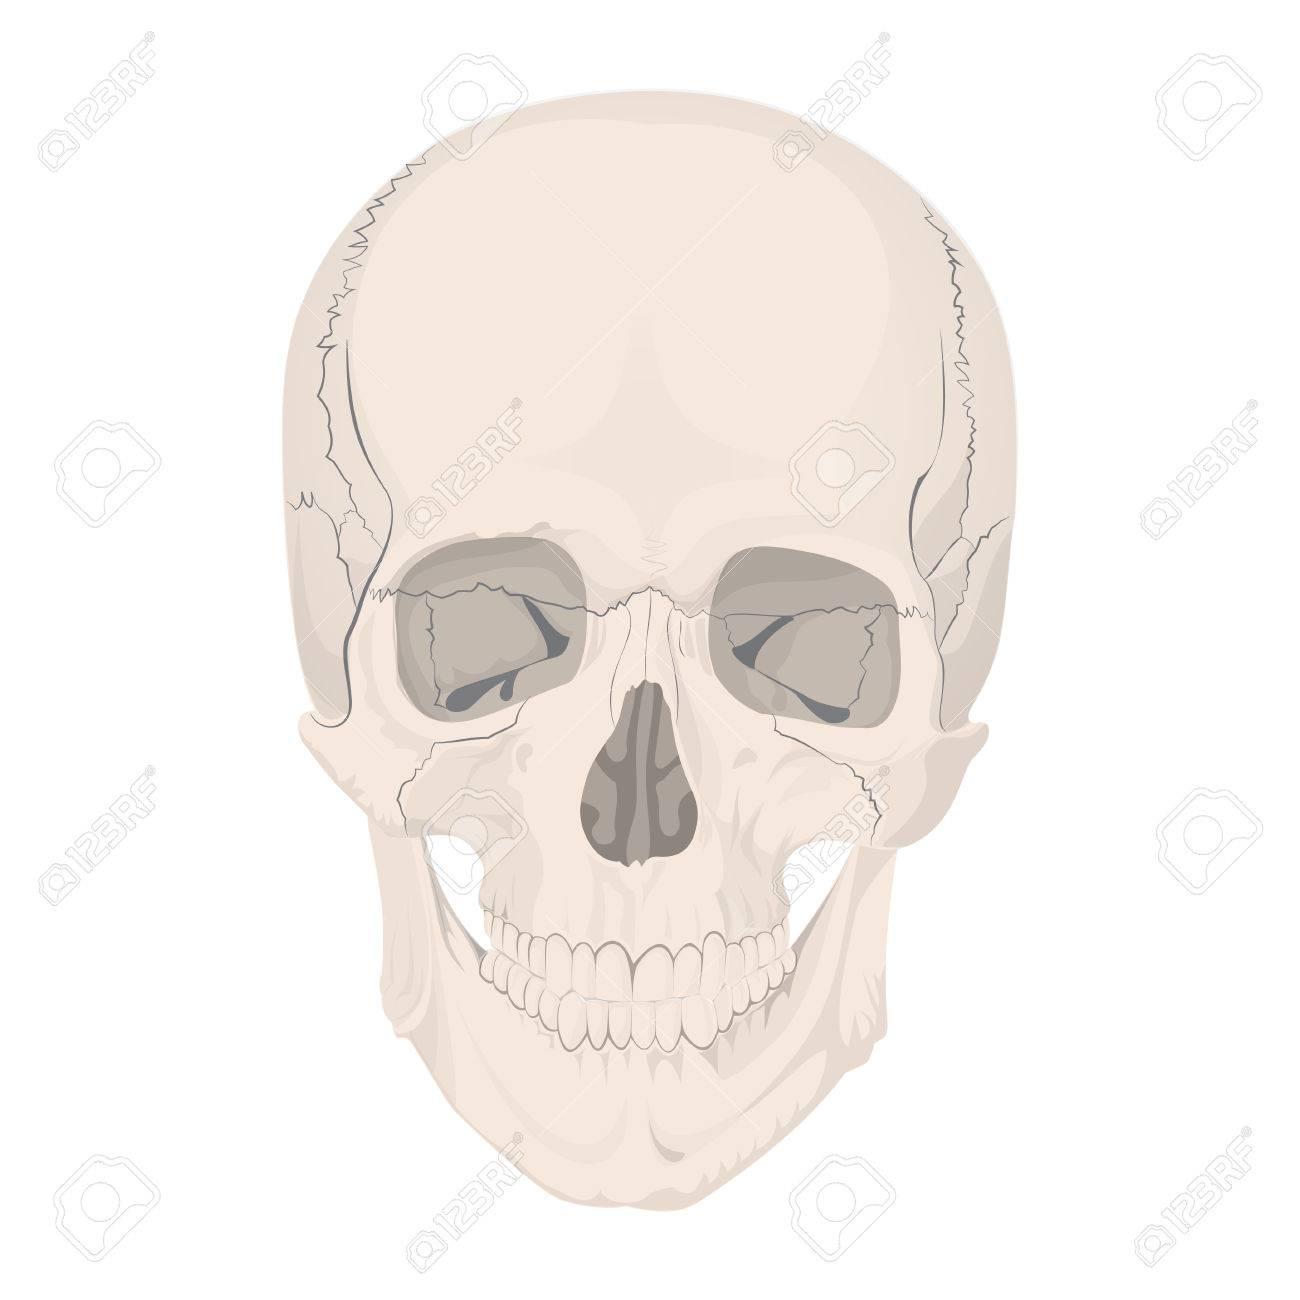 Human Skull Bones Skeleton Dead Anatomy Illustration Stock Photo